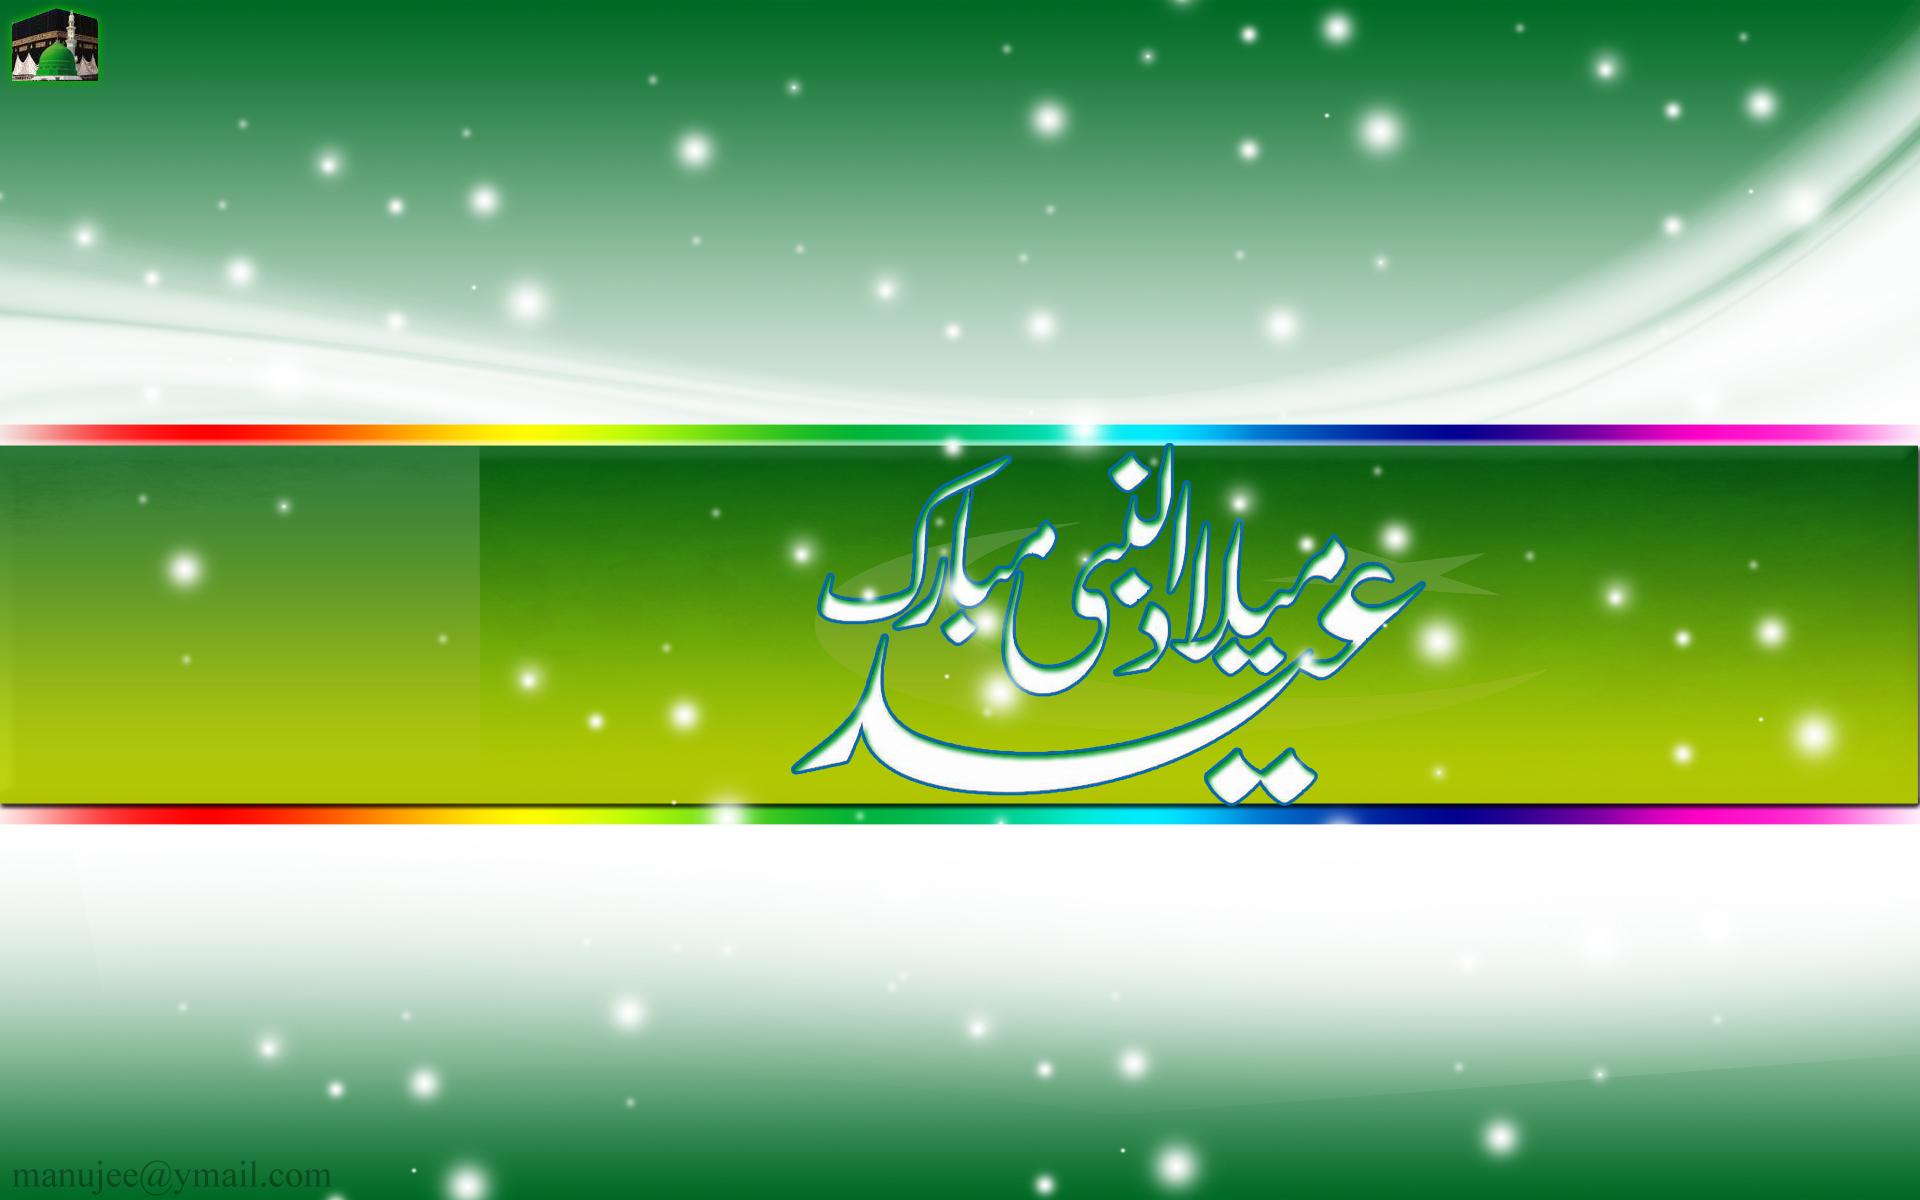 eid milad un nabi free hd wallpapers for backgrounds hd wallpaper eid milad un nabi free hd wallpapers